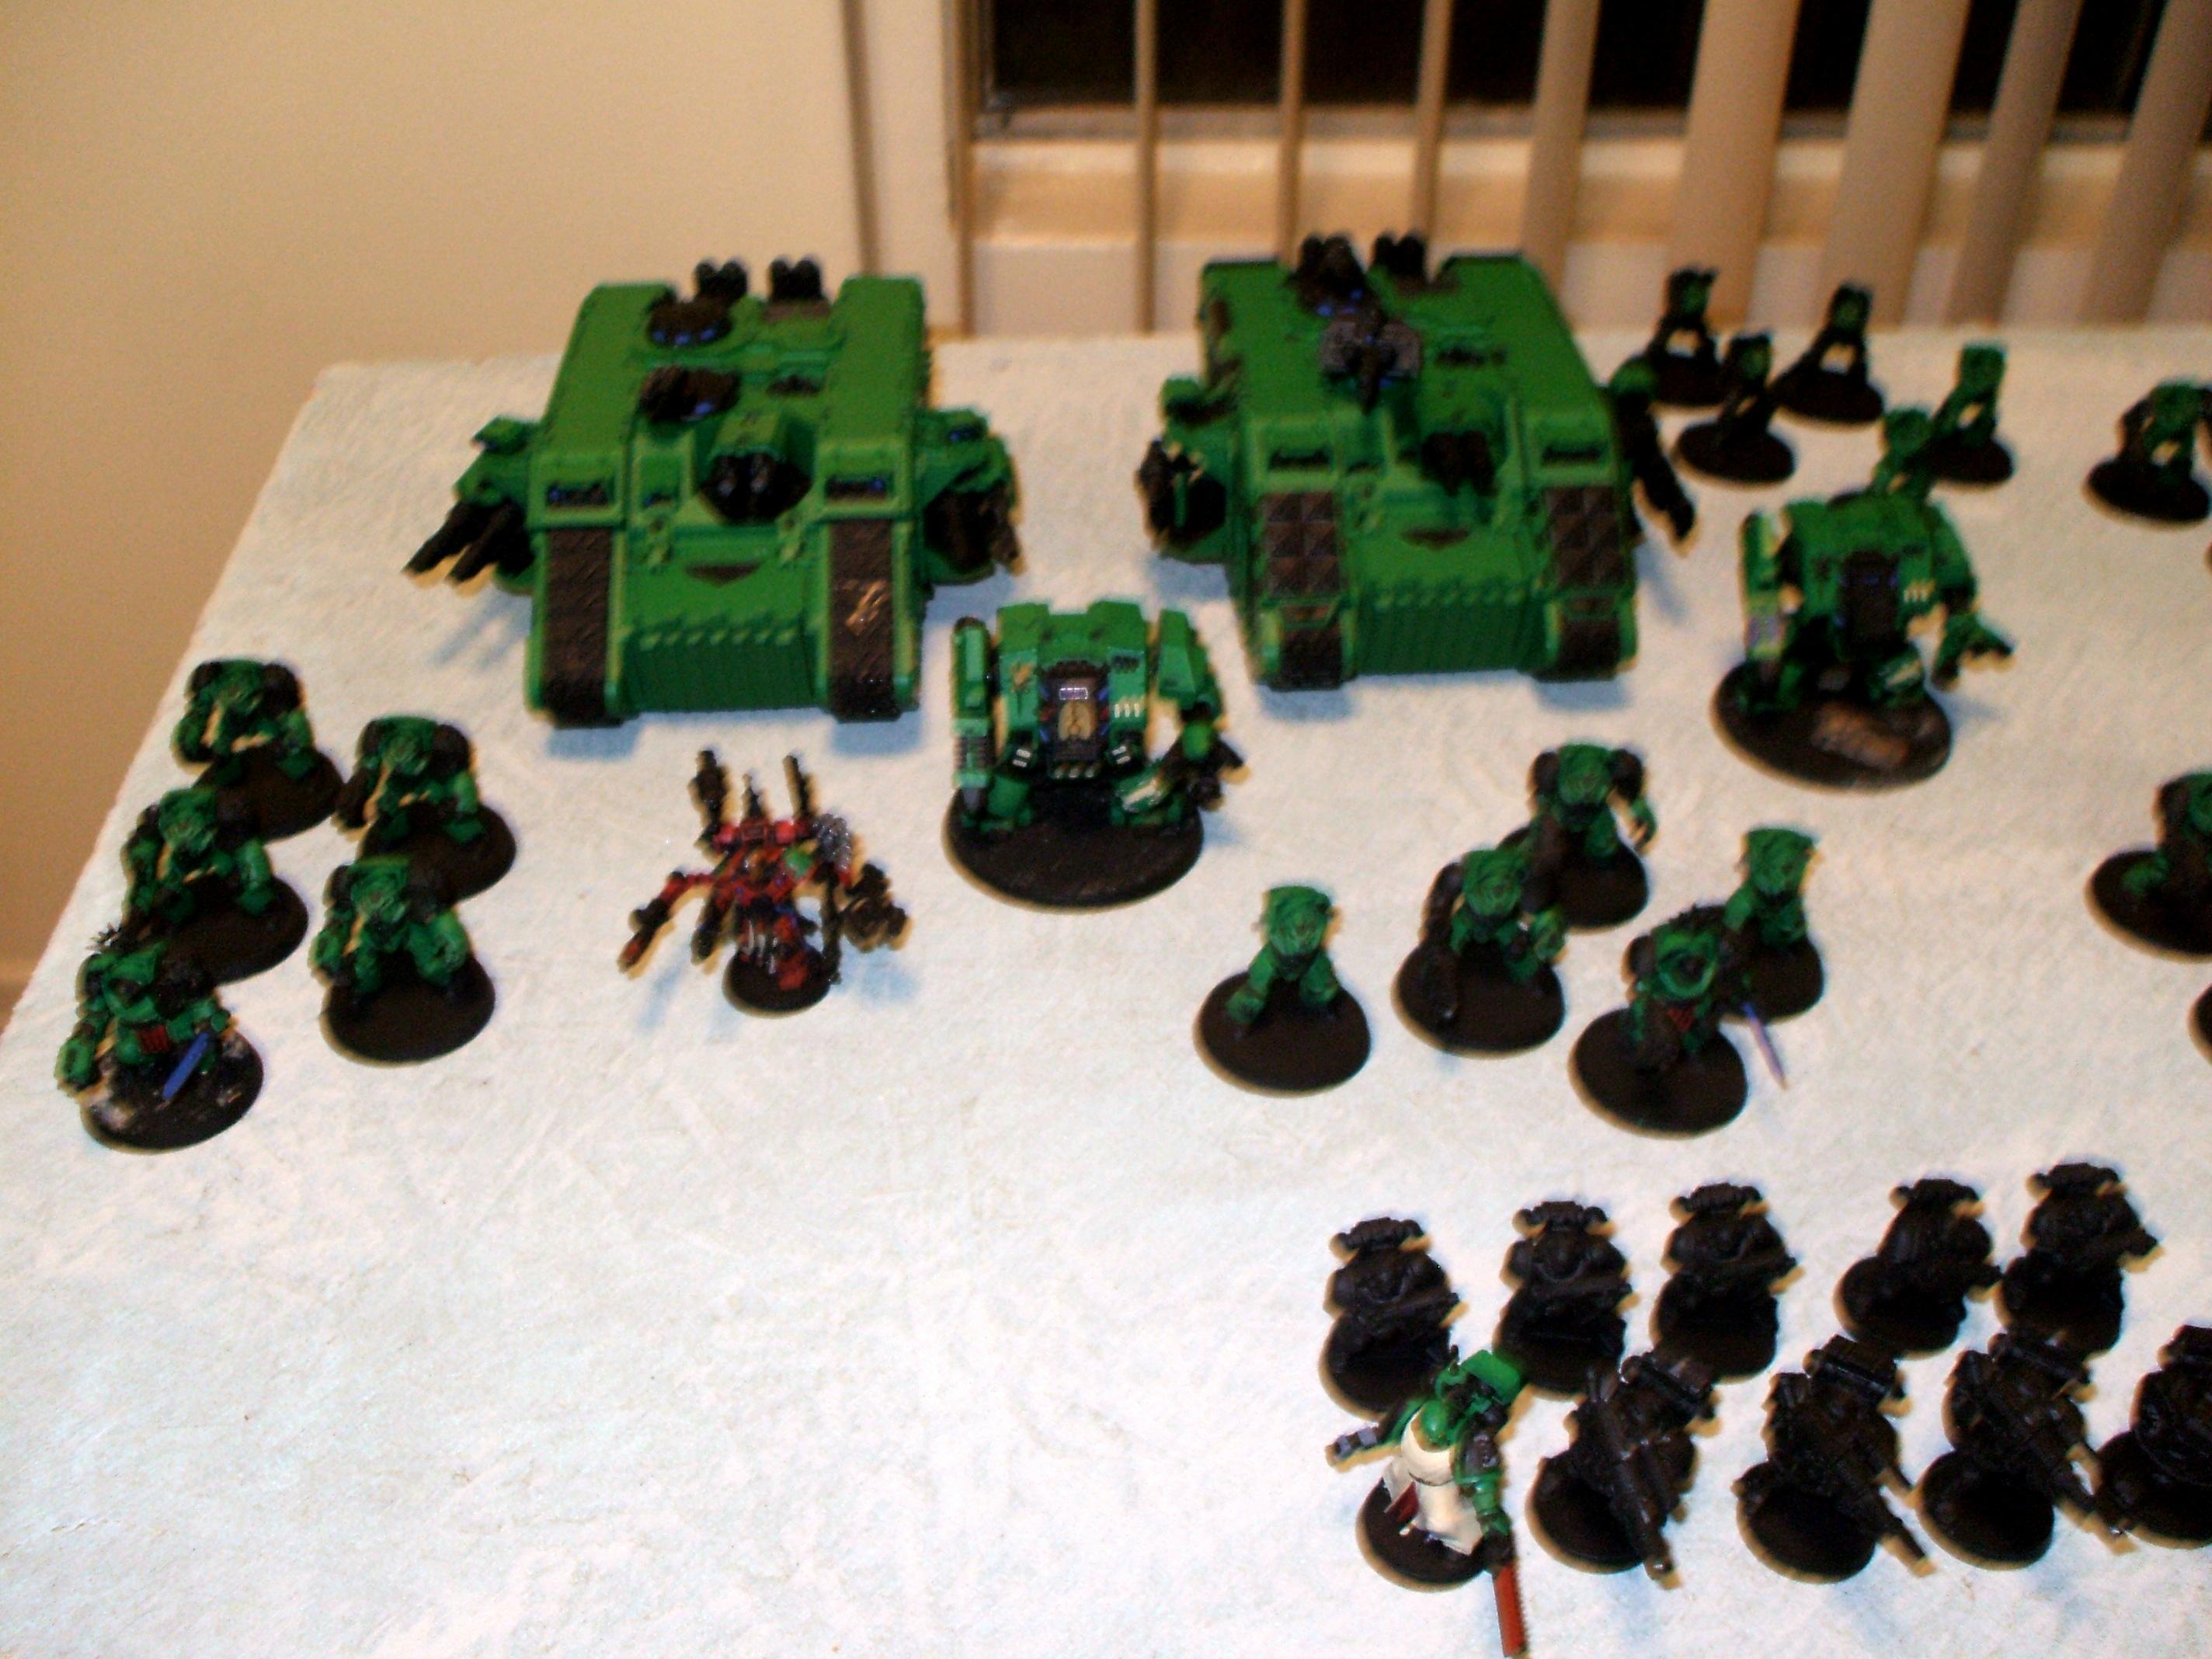 Army, Chaos, Chaos Space Marines, Fabius Bile, Land Raider, Terminator Armor, Work In Progress